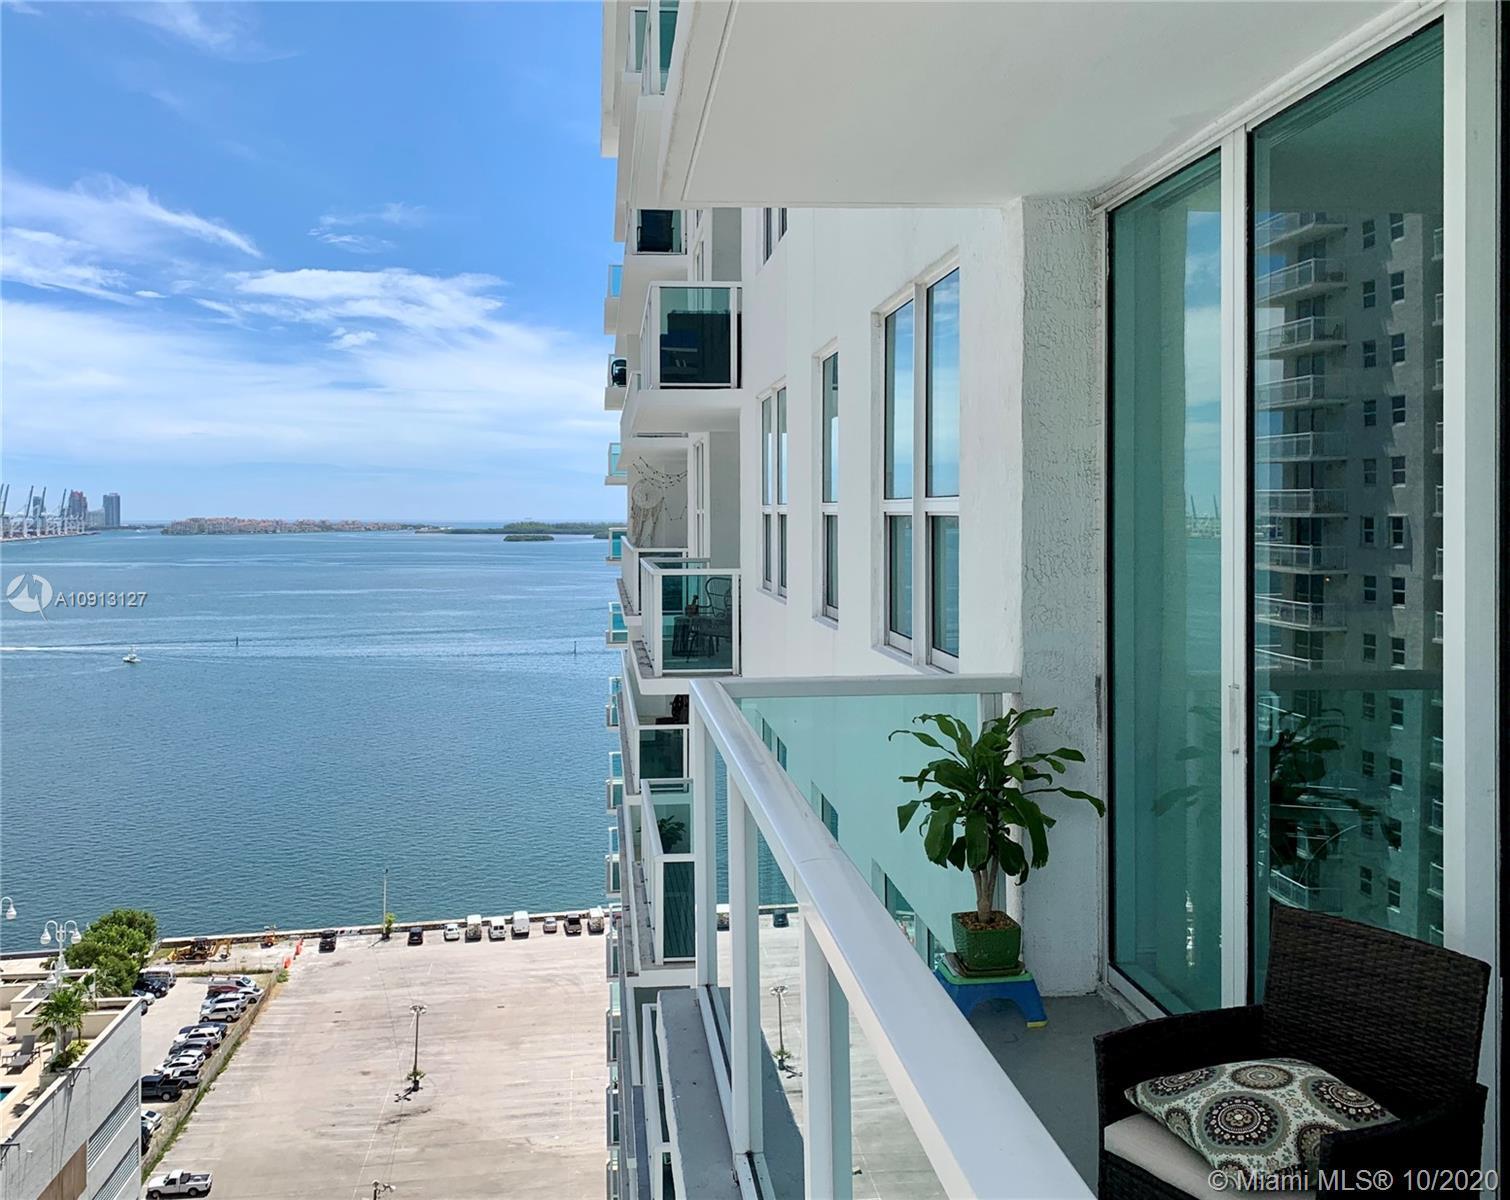 Luxurious Location, corner unit in Stainless steel appliances, wood floor, granite counters, walk-in